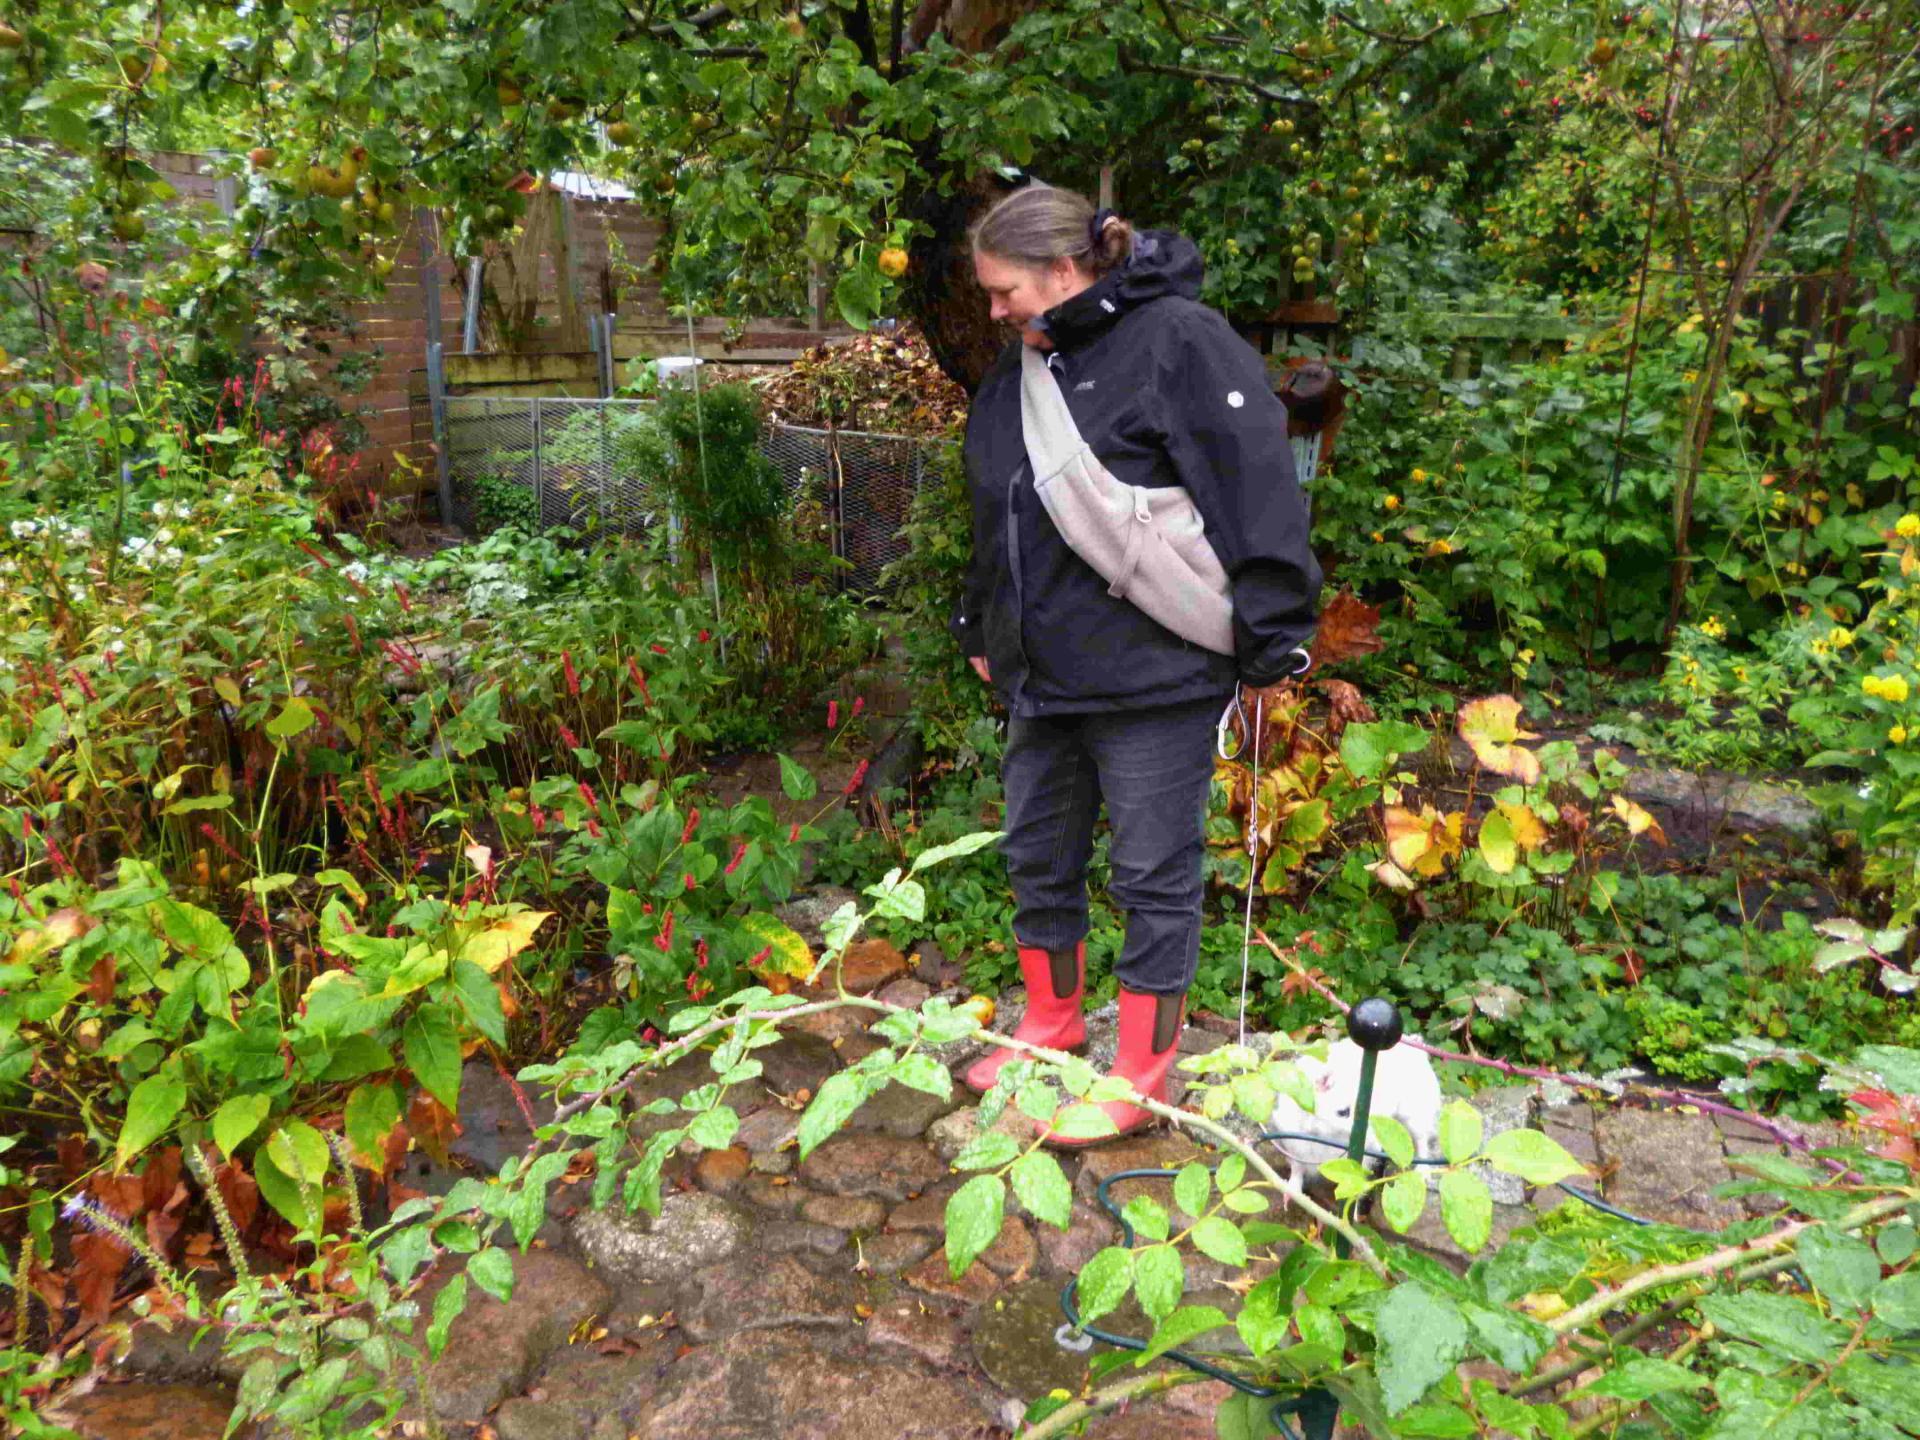 Offene Gartenpfporte 26-09-2020 Bild 19